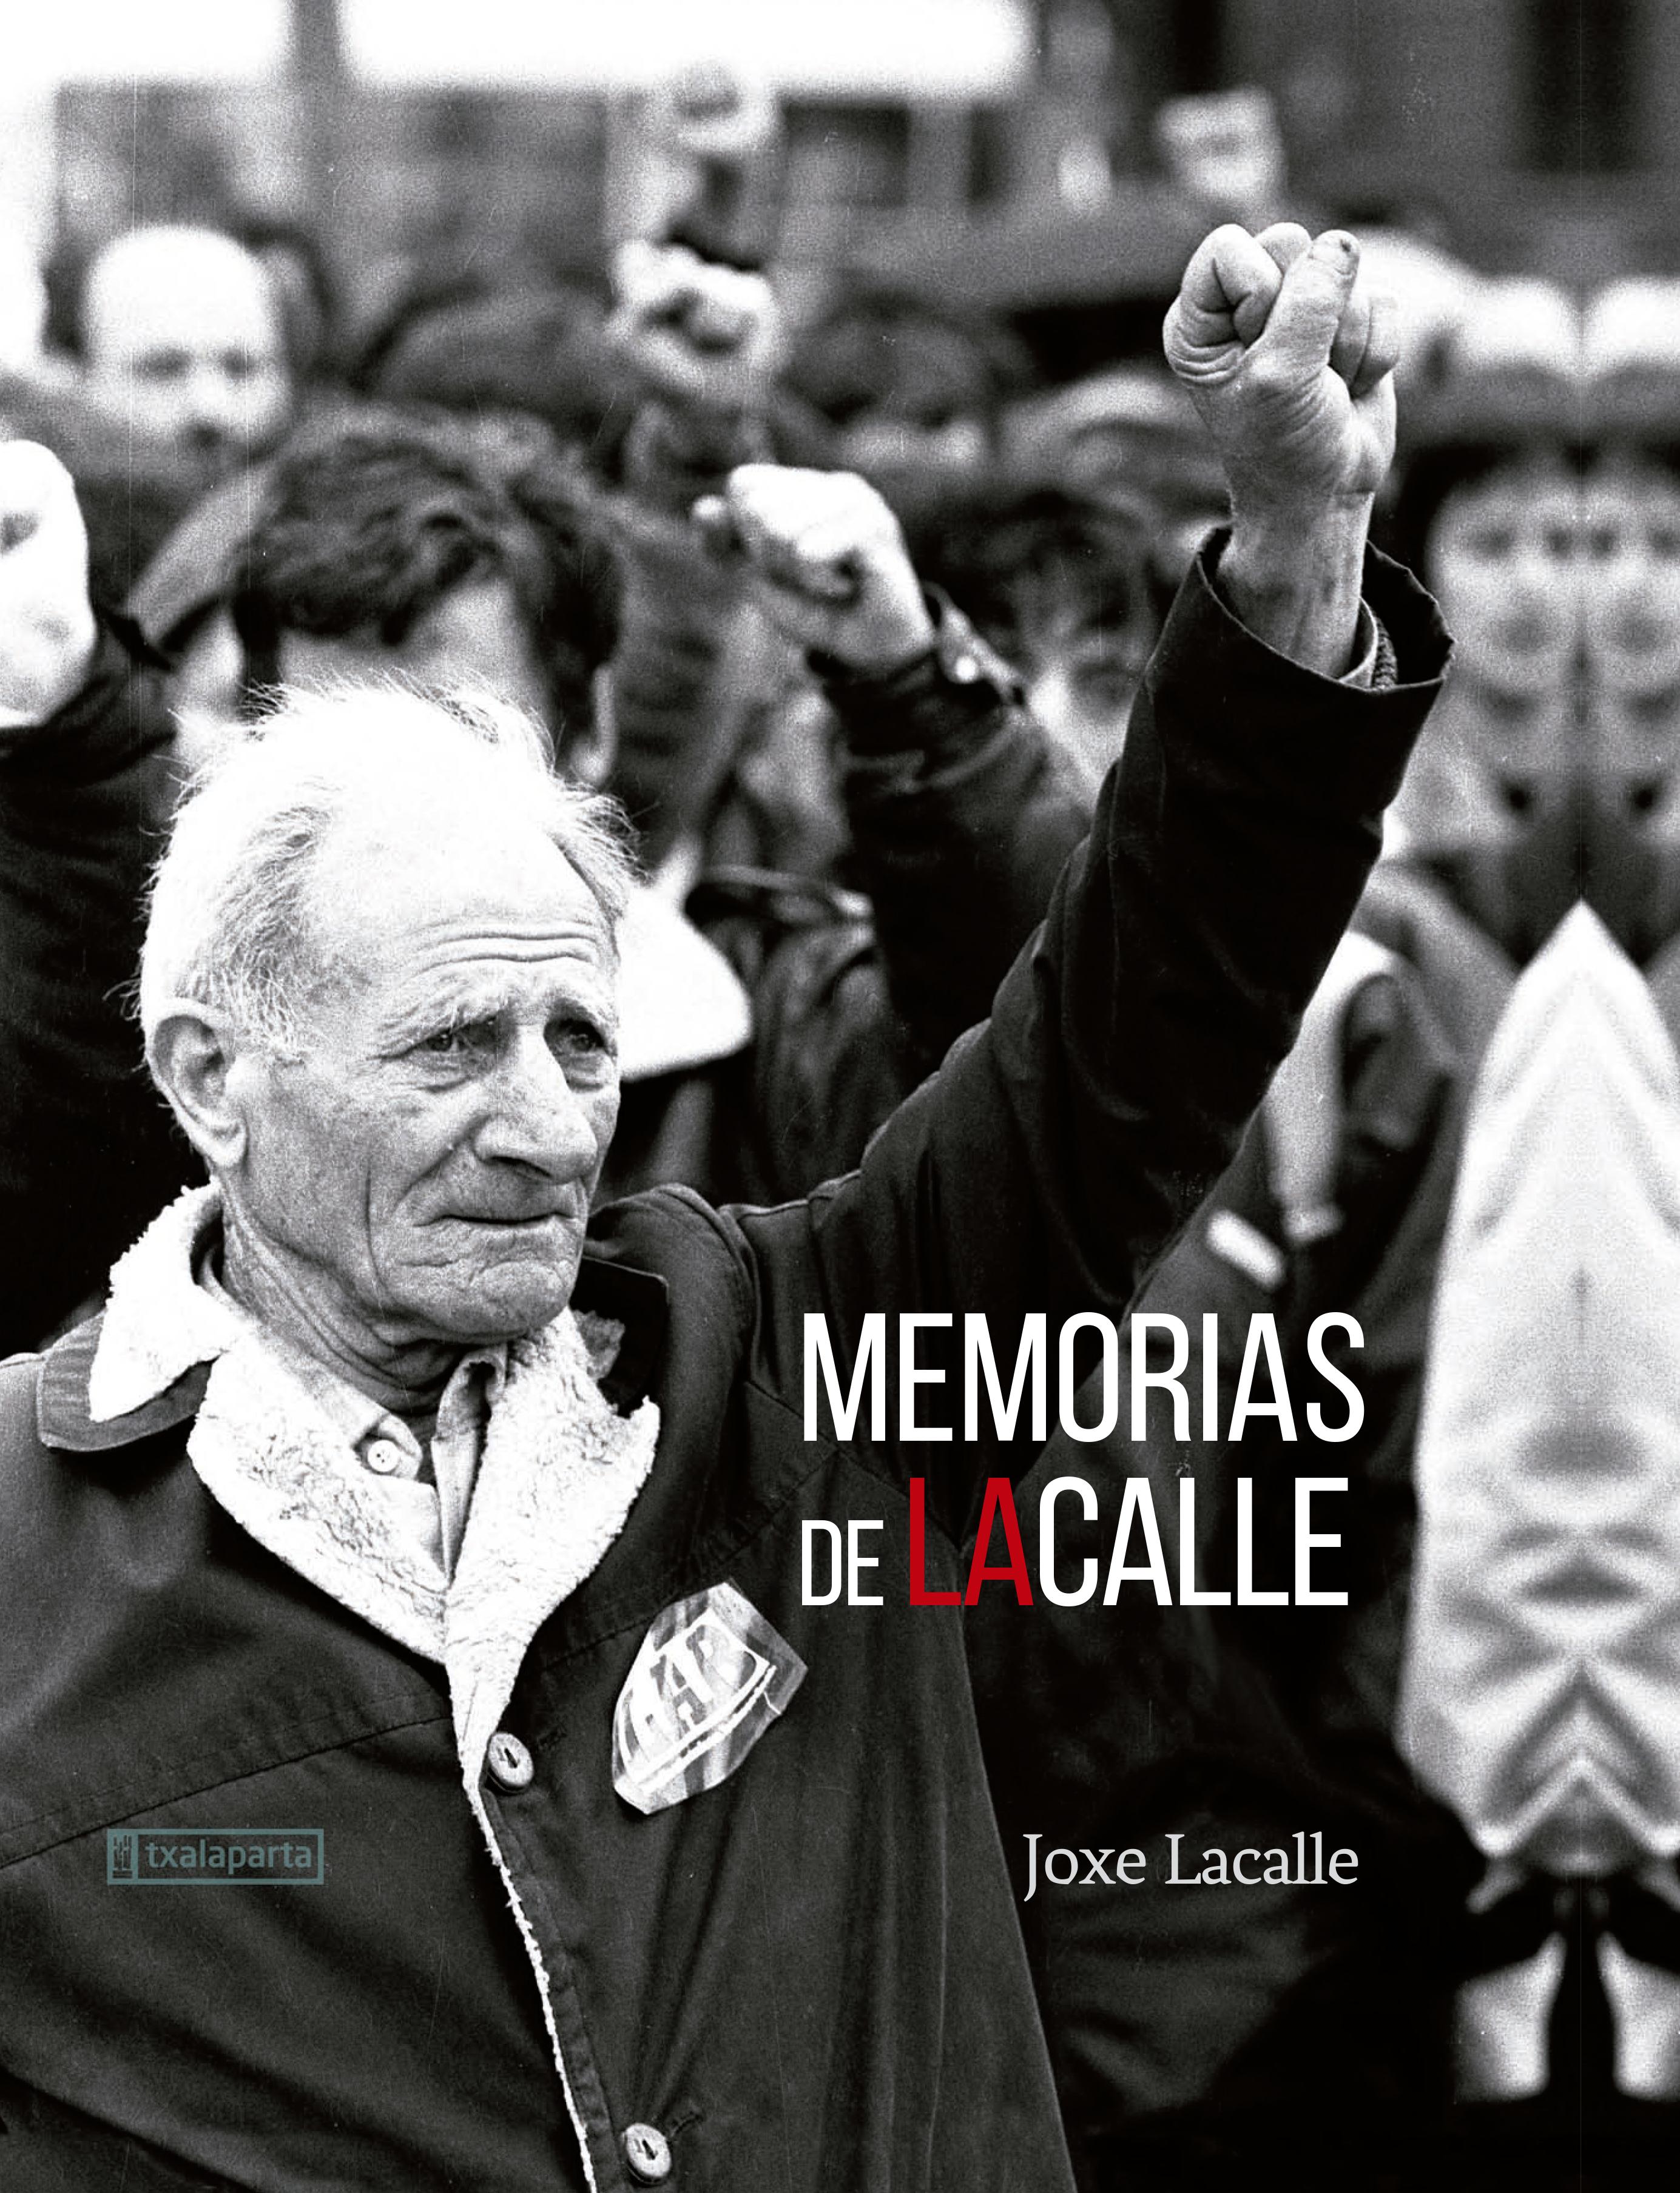 memorias-de-lacalle-978-84-17065-25-6